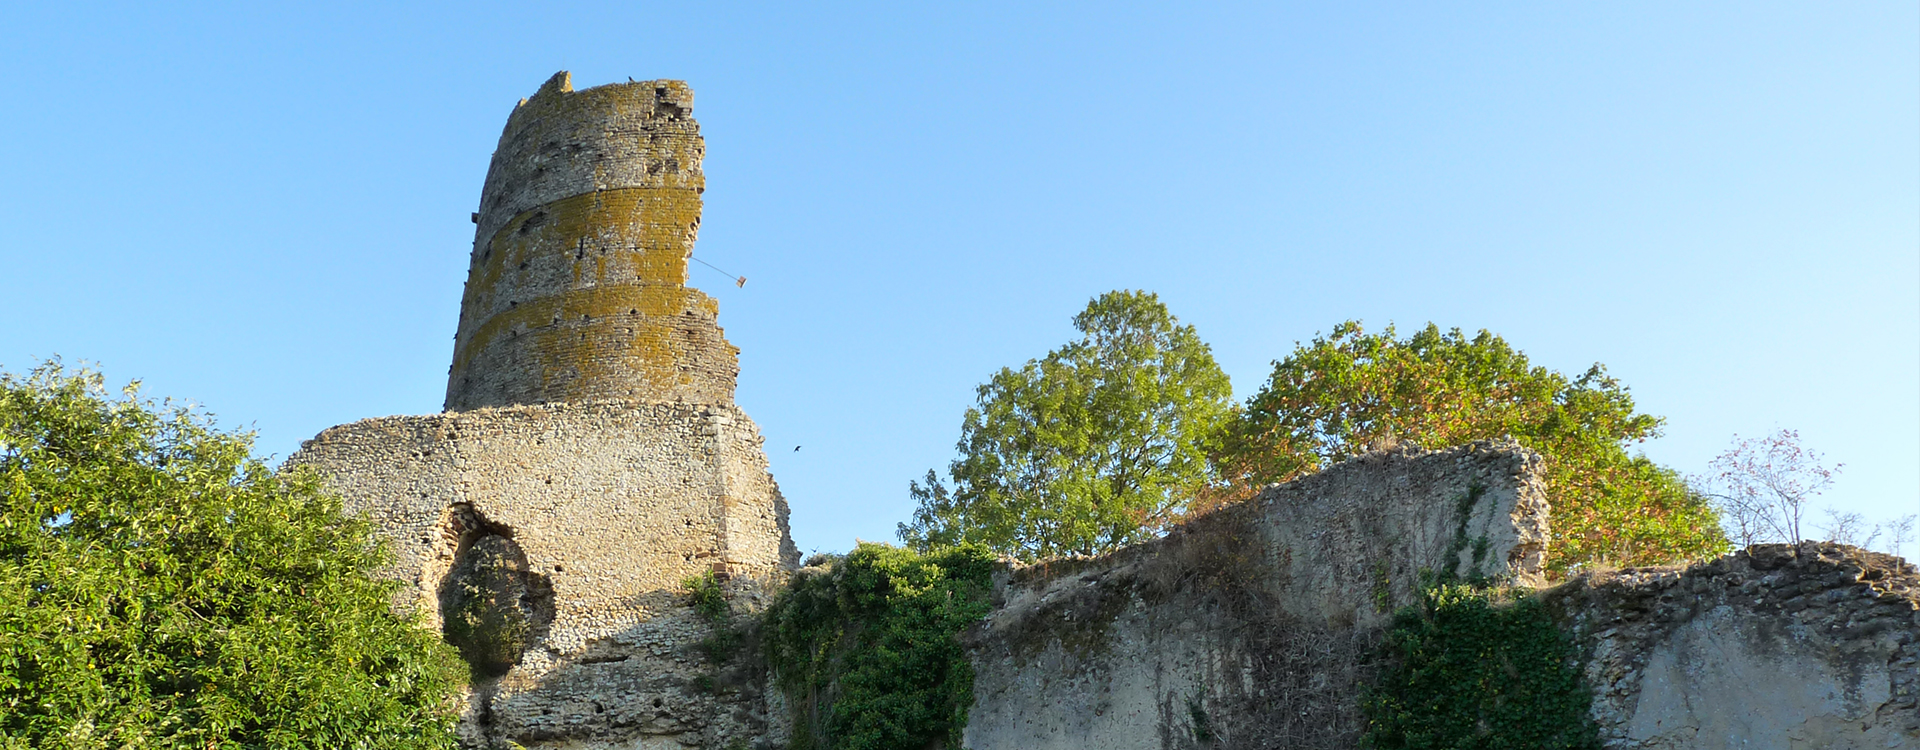 Mairie de Mondoubleau